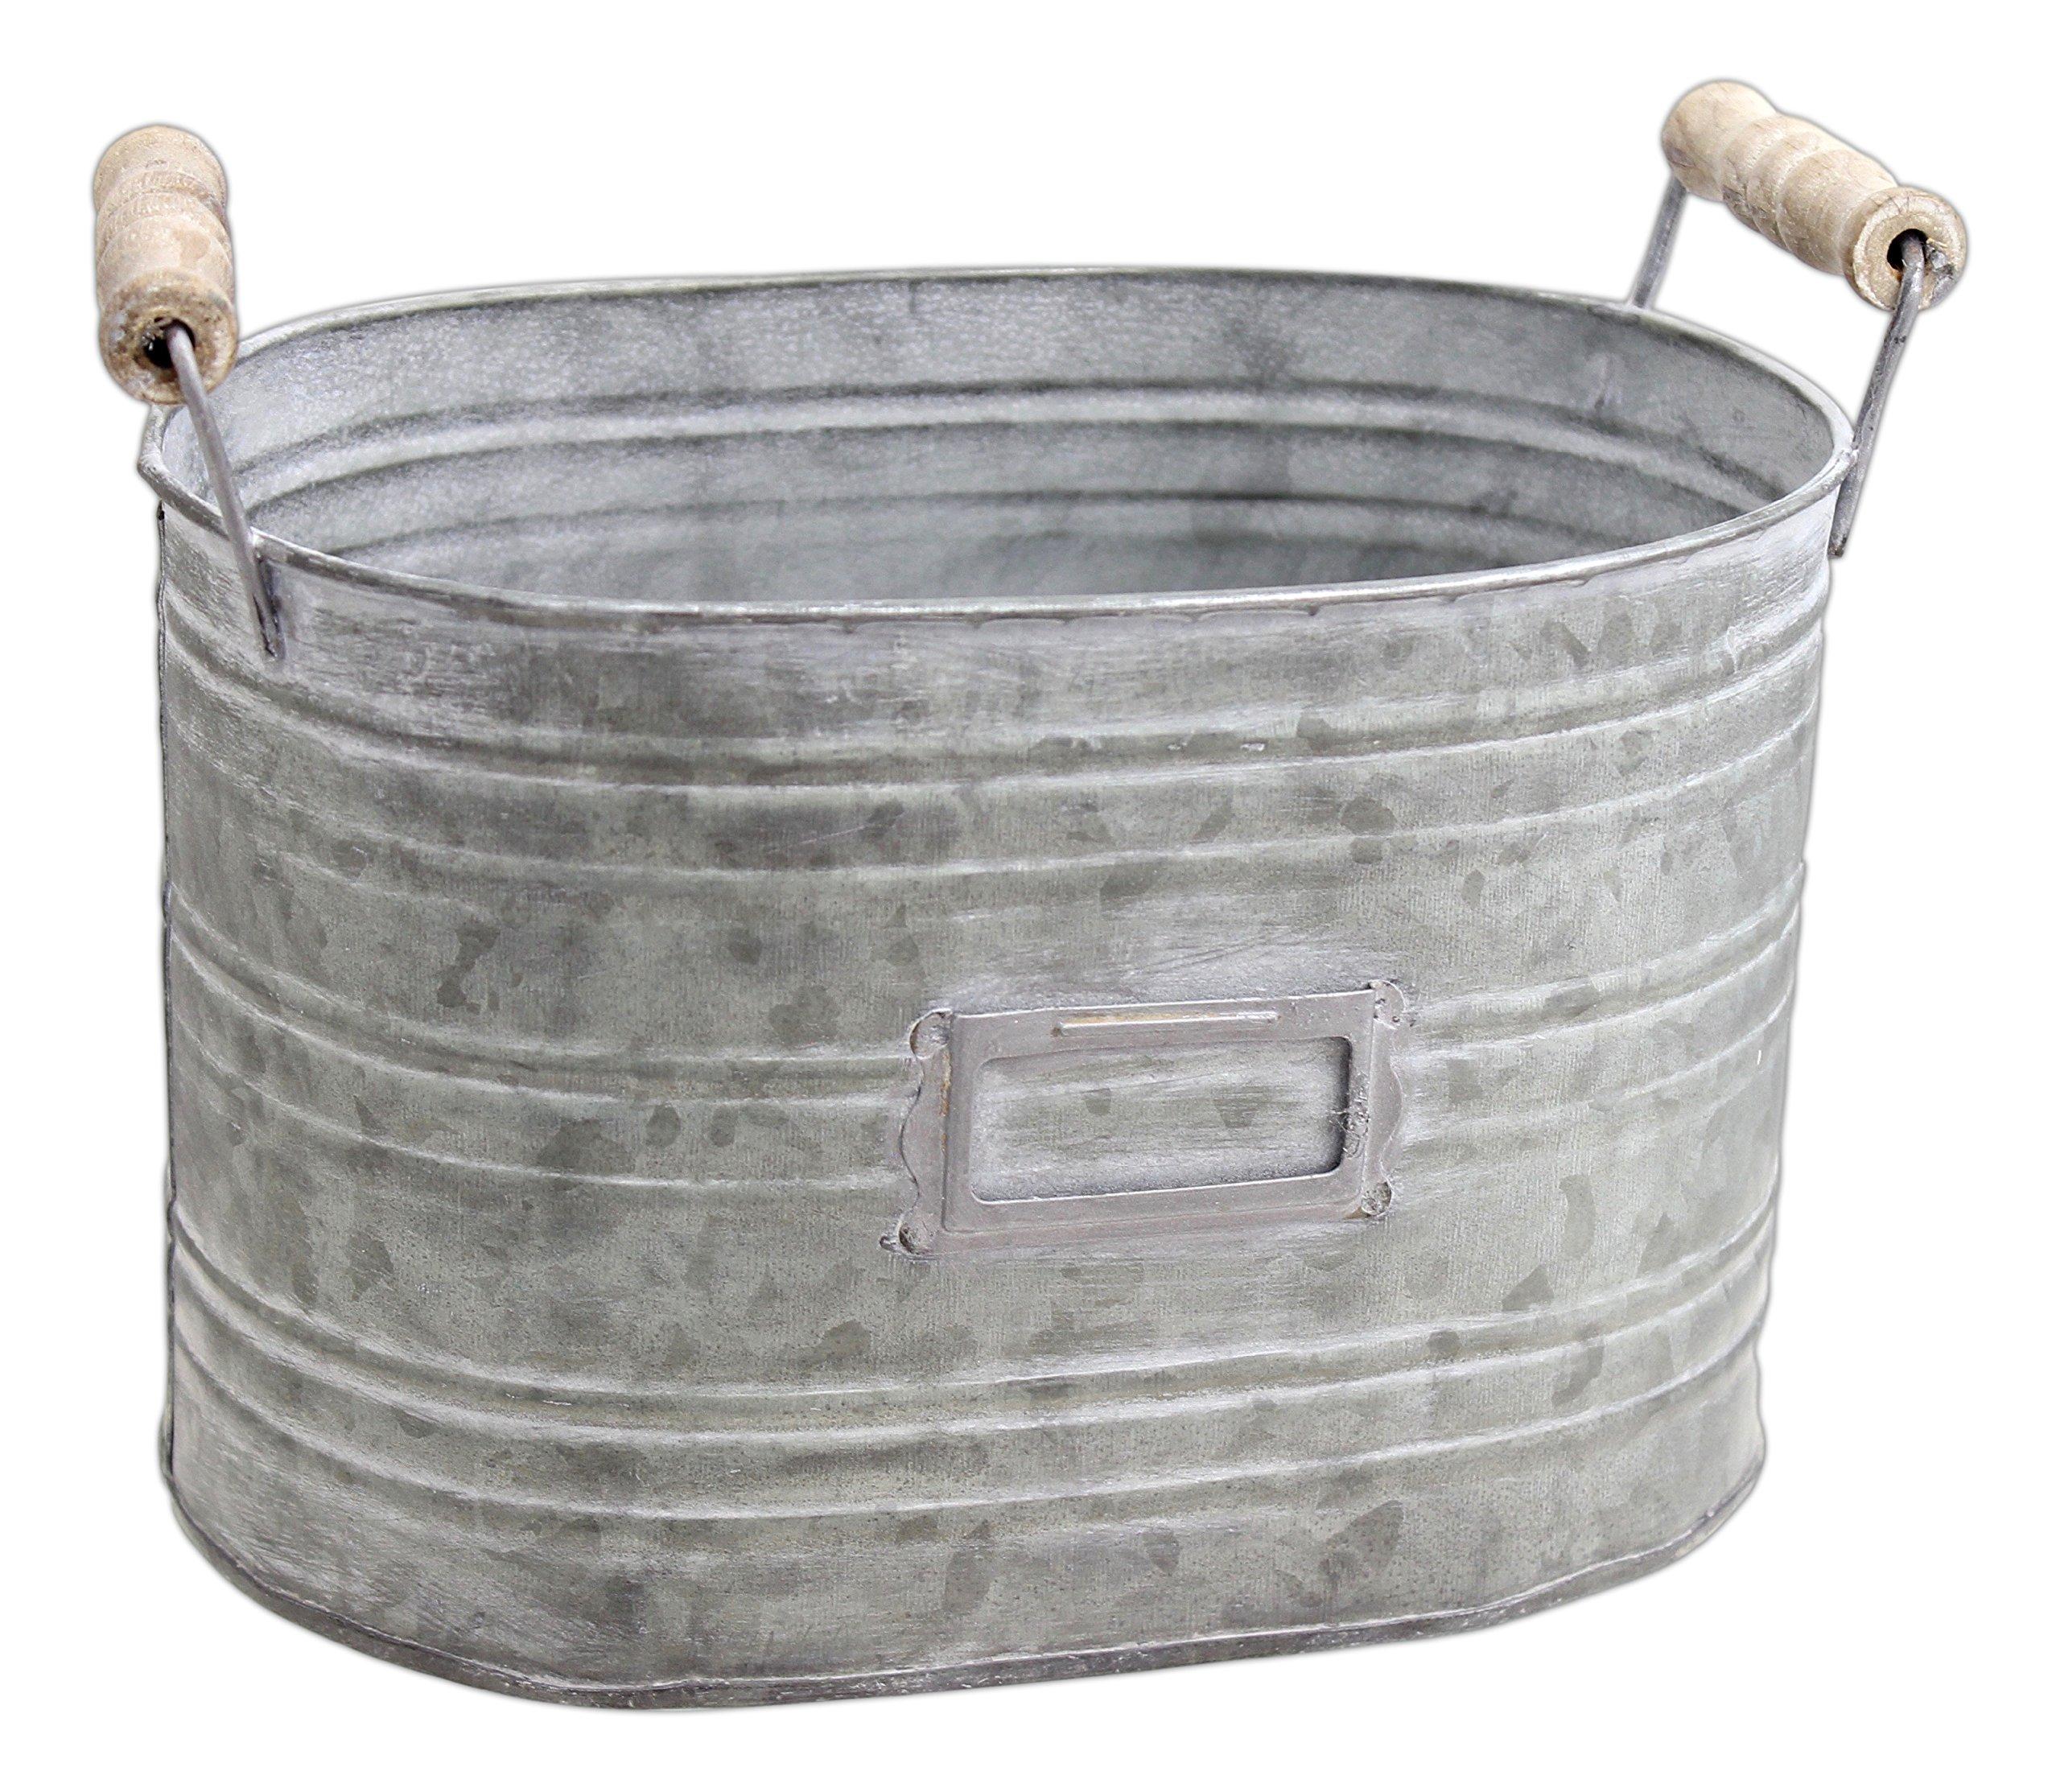 Park Hill 5.5'' x 8.5'' Rustic Oblong Metal Bucket Planter